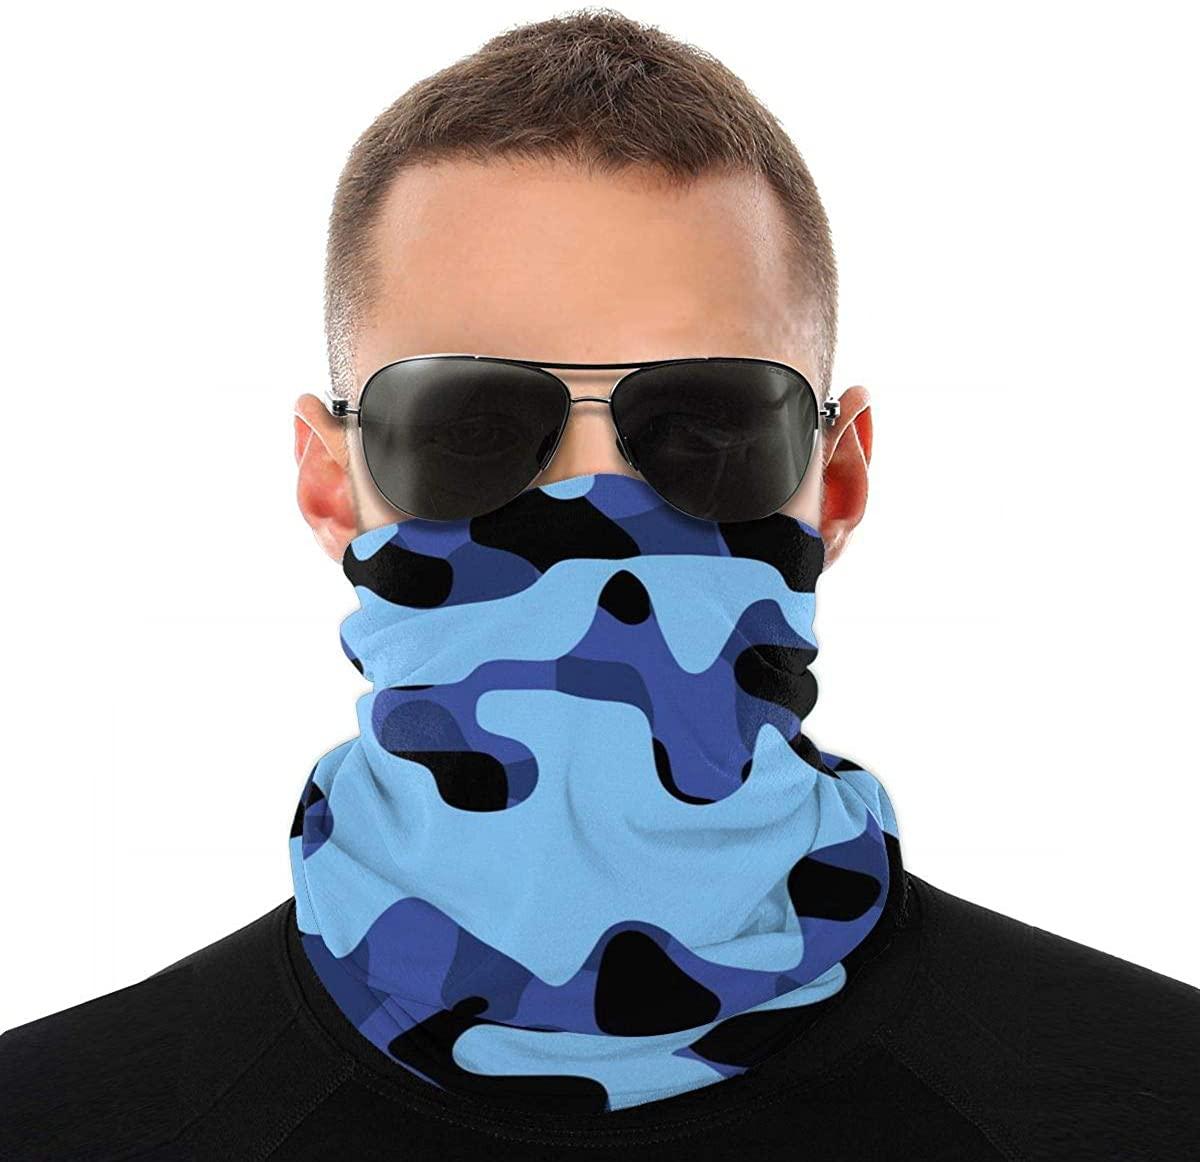 Multifunctional Neck Scarf Bandana Tube Mask For Workout Outdoor Sports